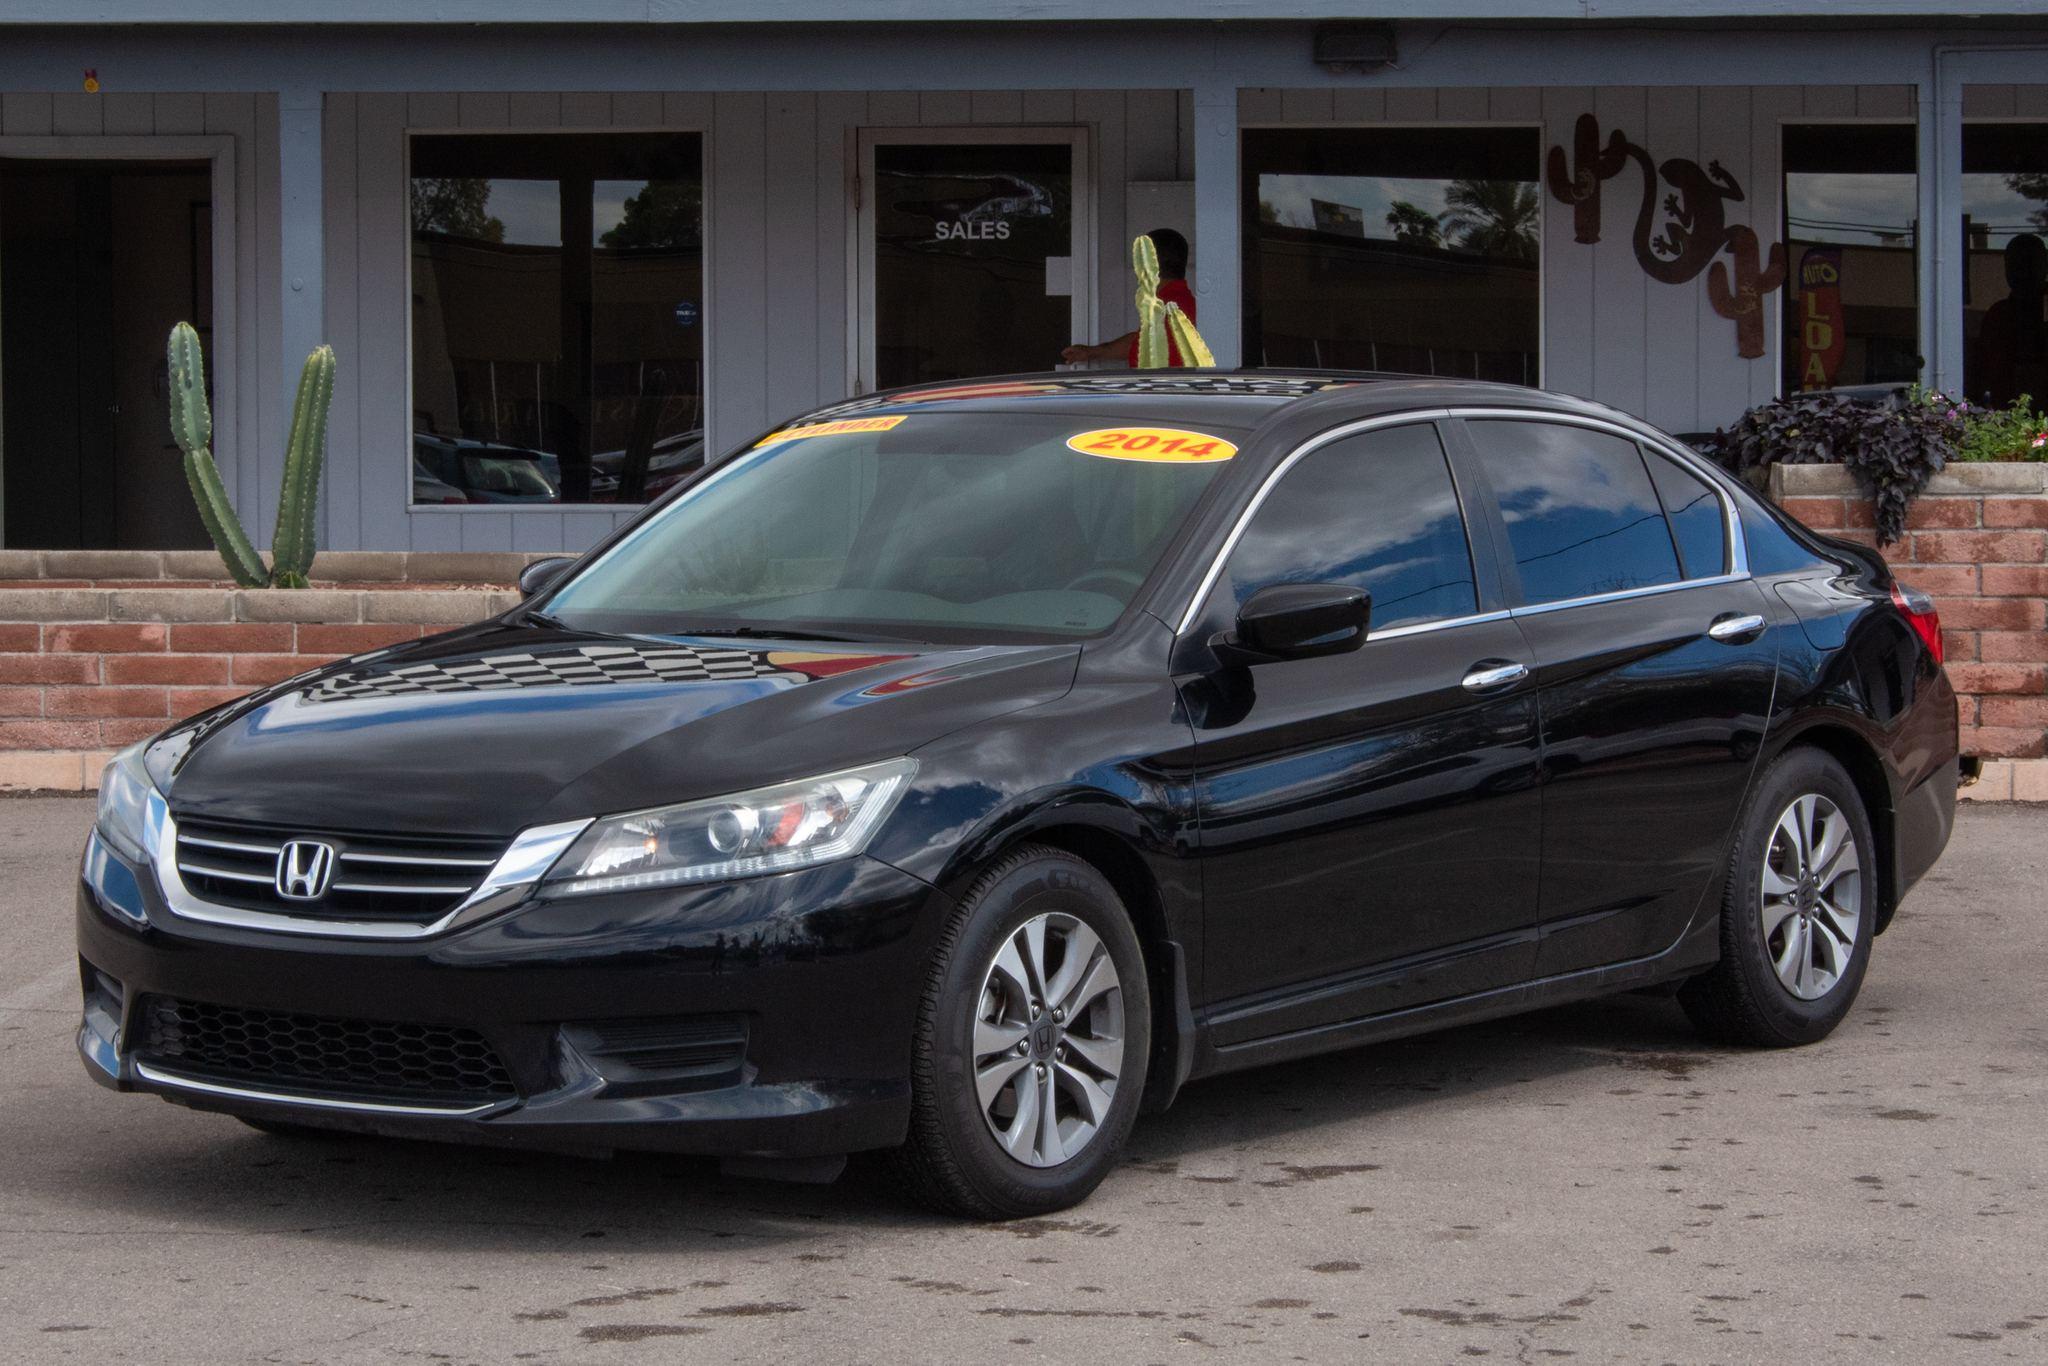 Photo of 2014 Honda Accord Sedan 4d LX CVT